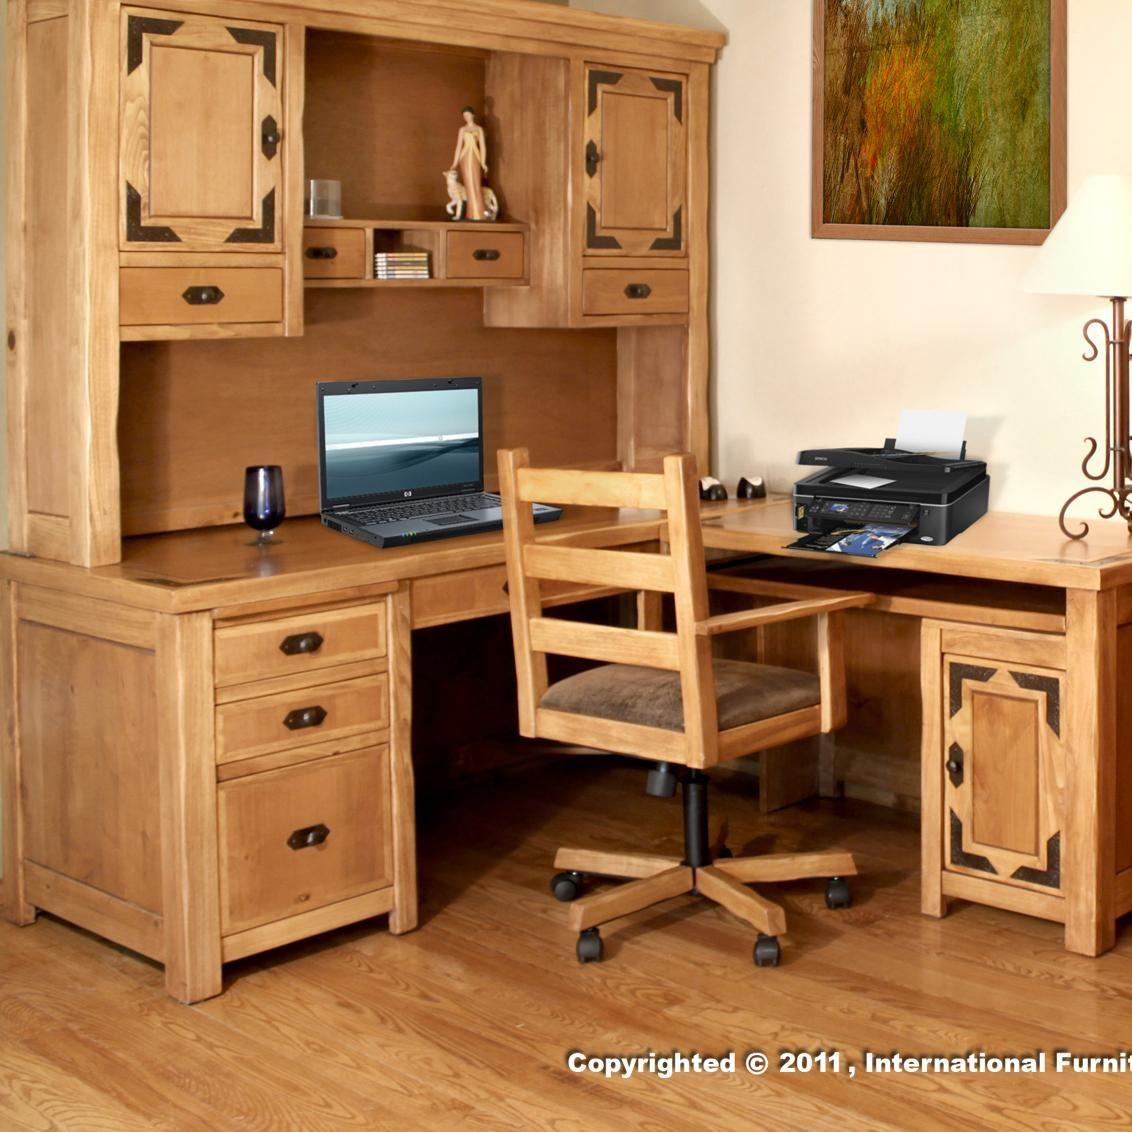 Lodge l shape desk by artisan home by international furniture l